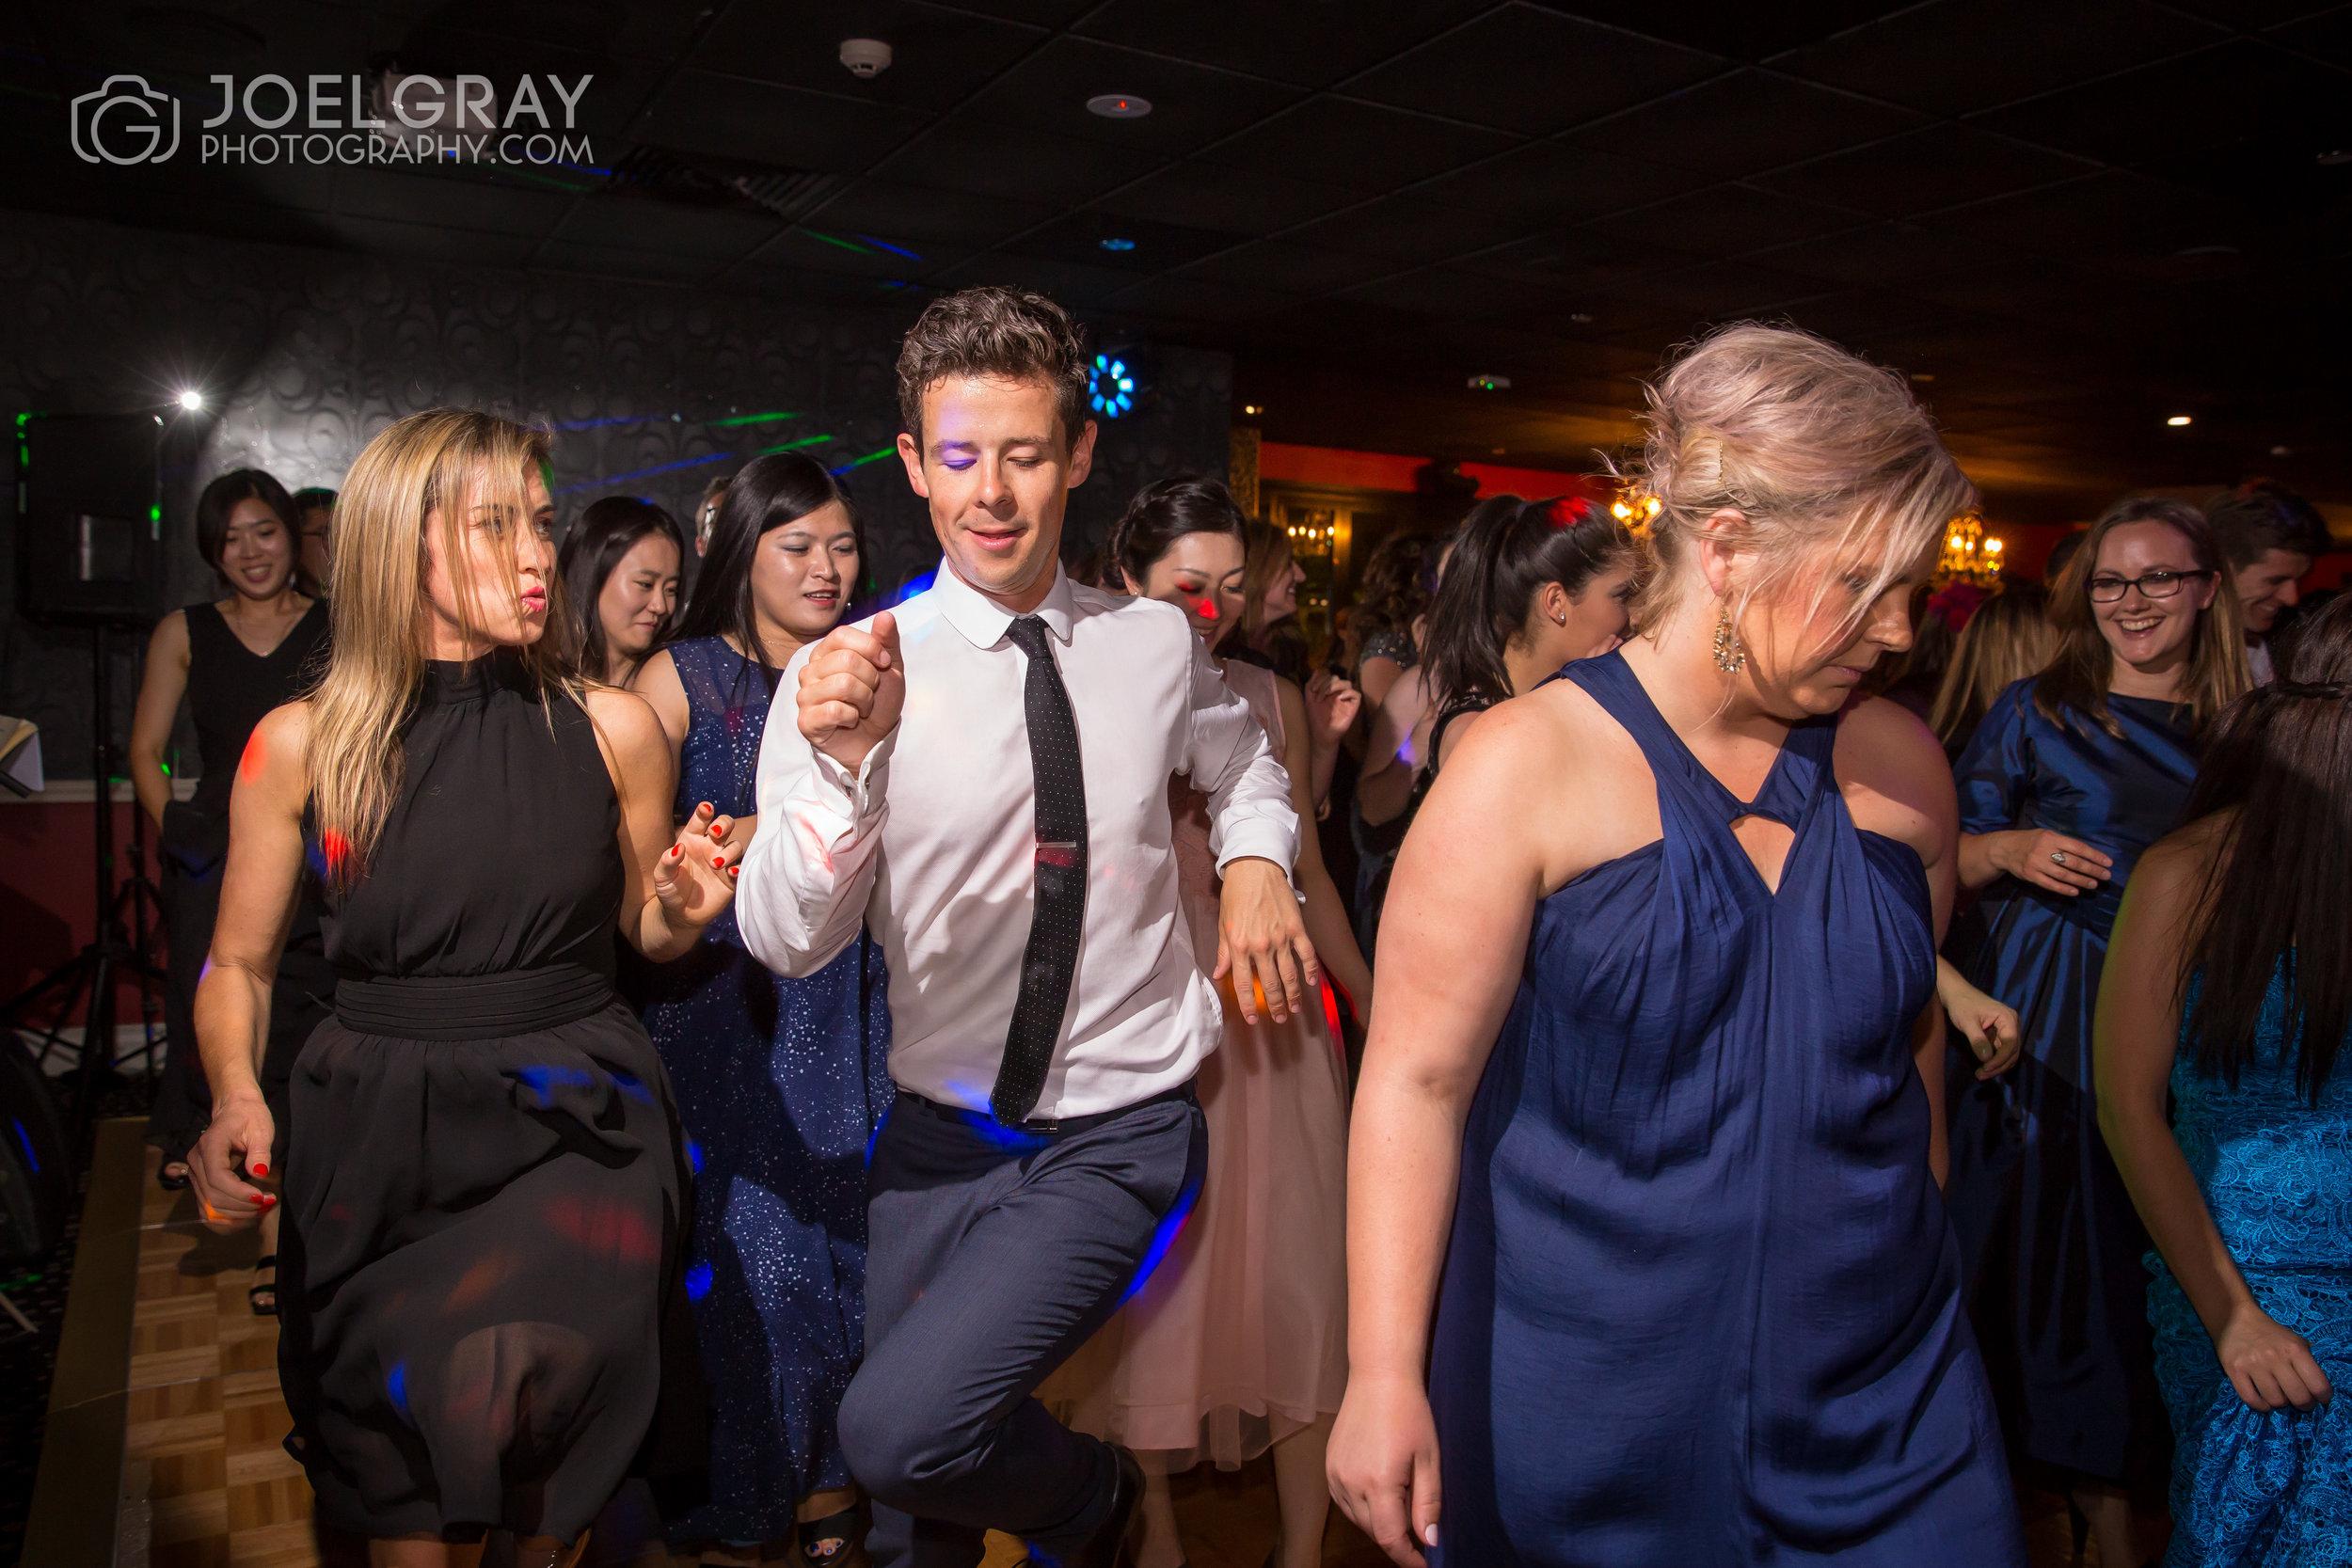 event-photos-sydney-corporate-events-photographer-1800829994